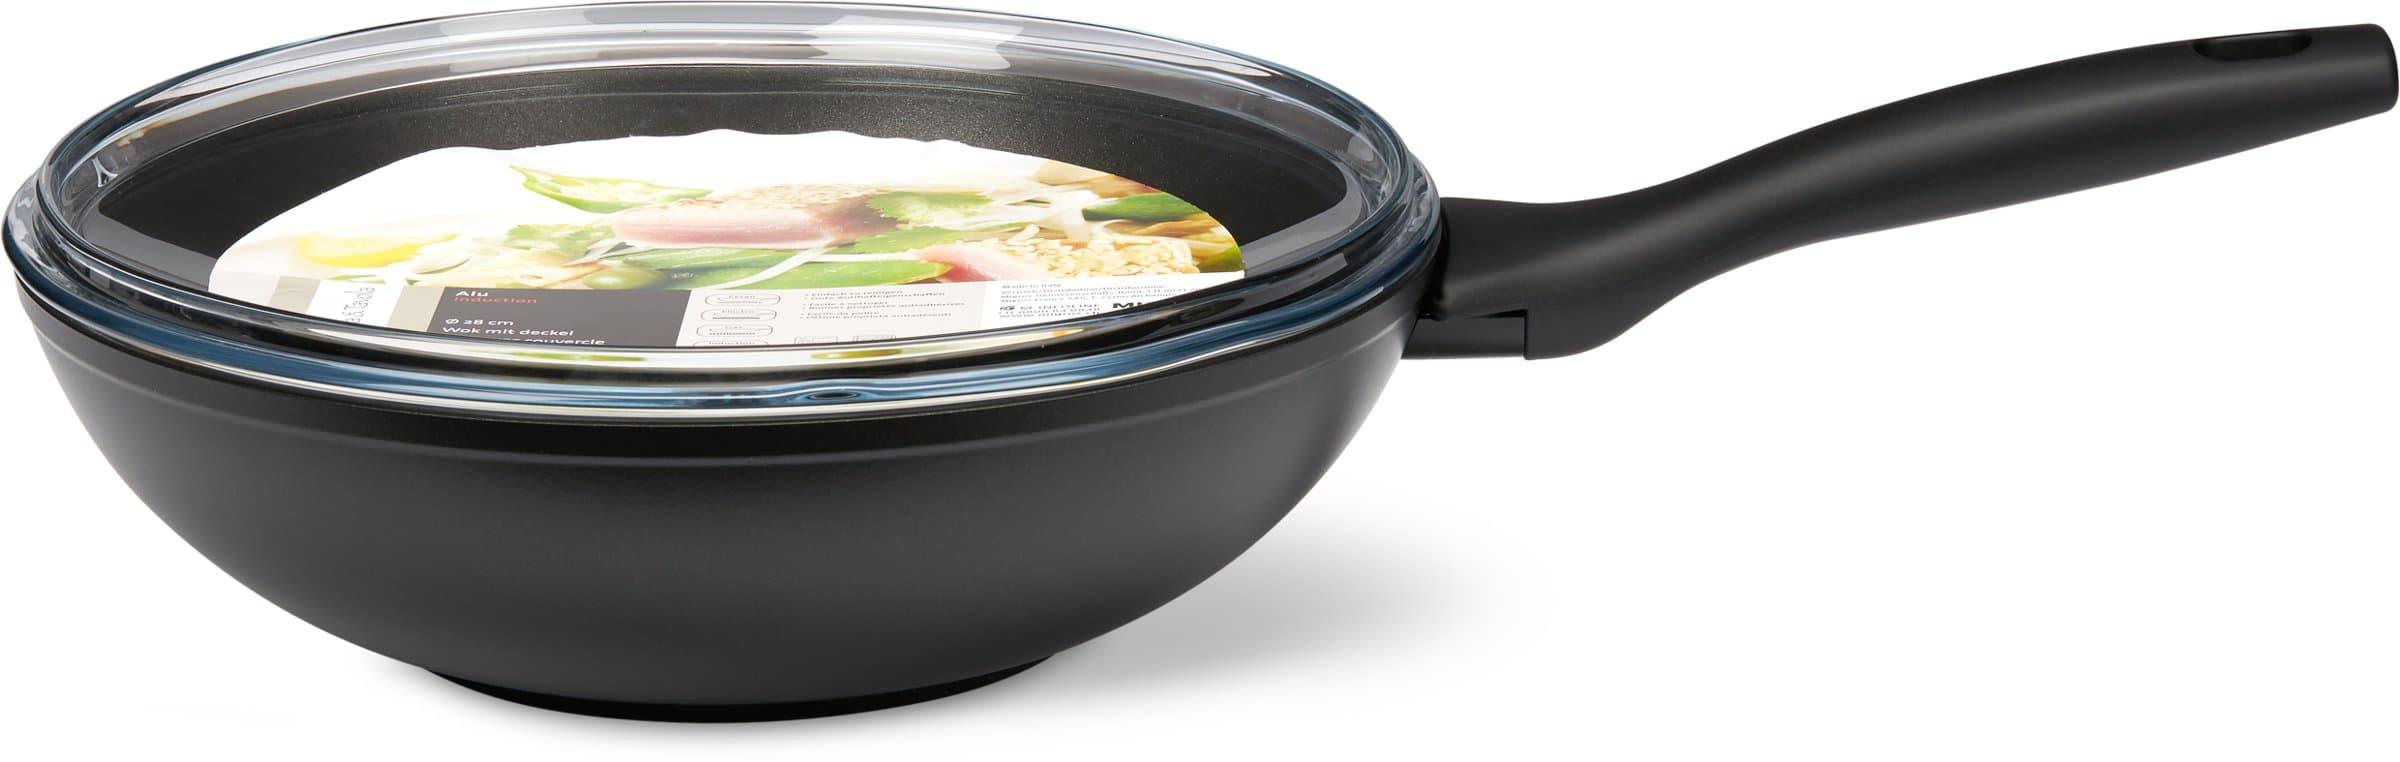 Cucina & Tavola CUCINA & TAVOLA Wok con coperchio